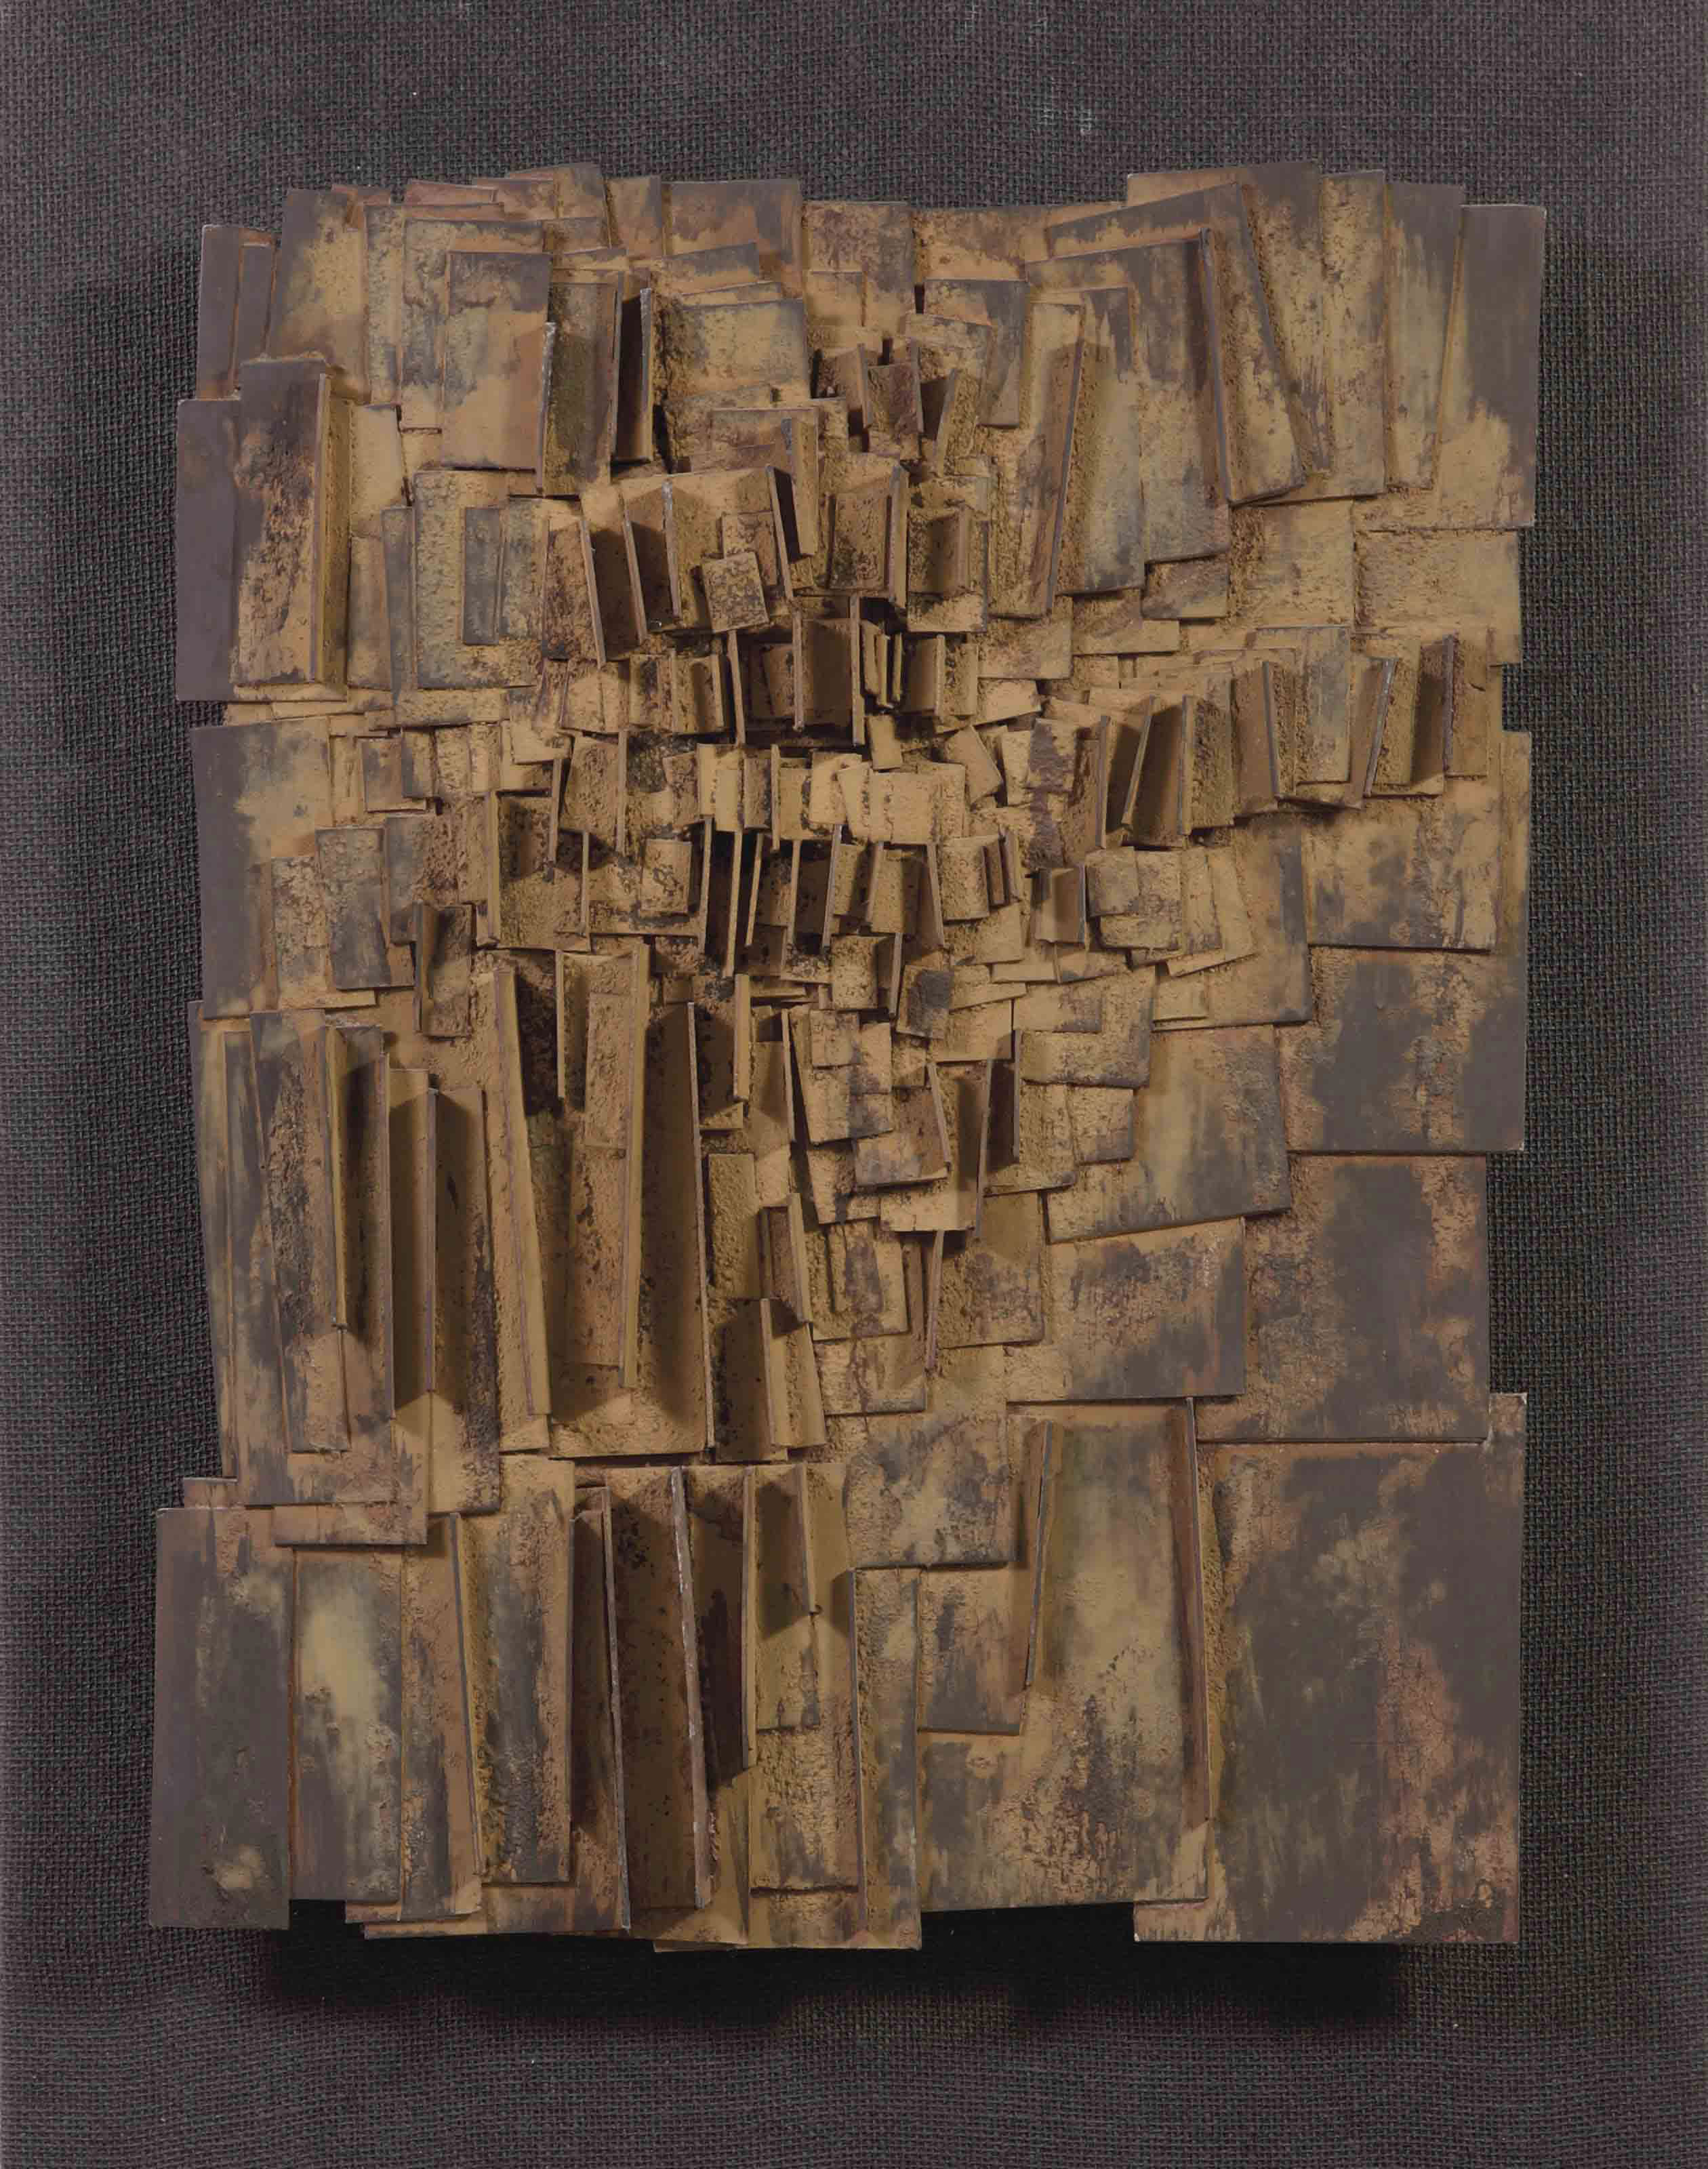 Jan Stroosma (1928-1983)